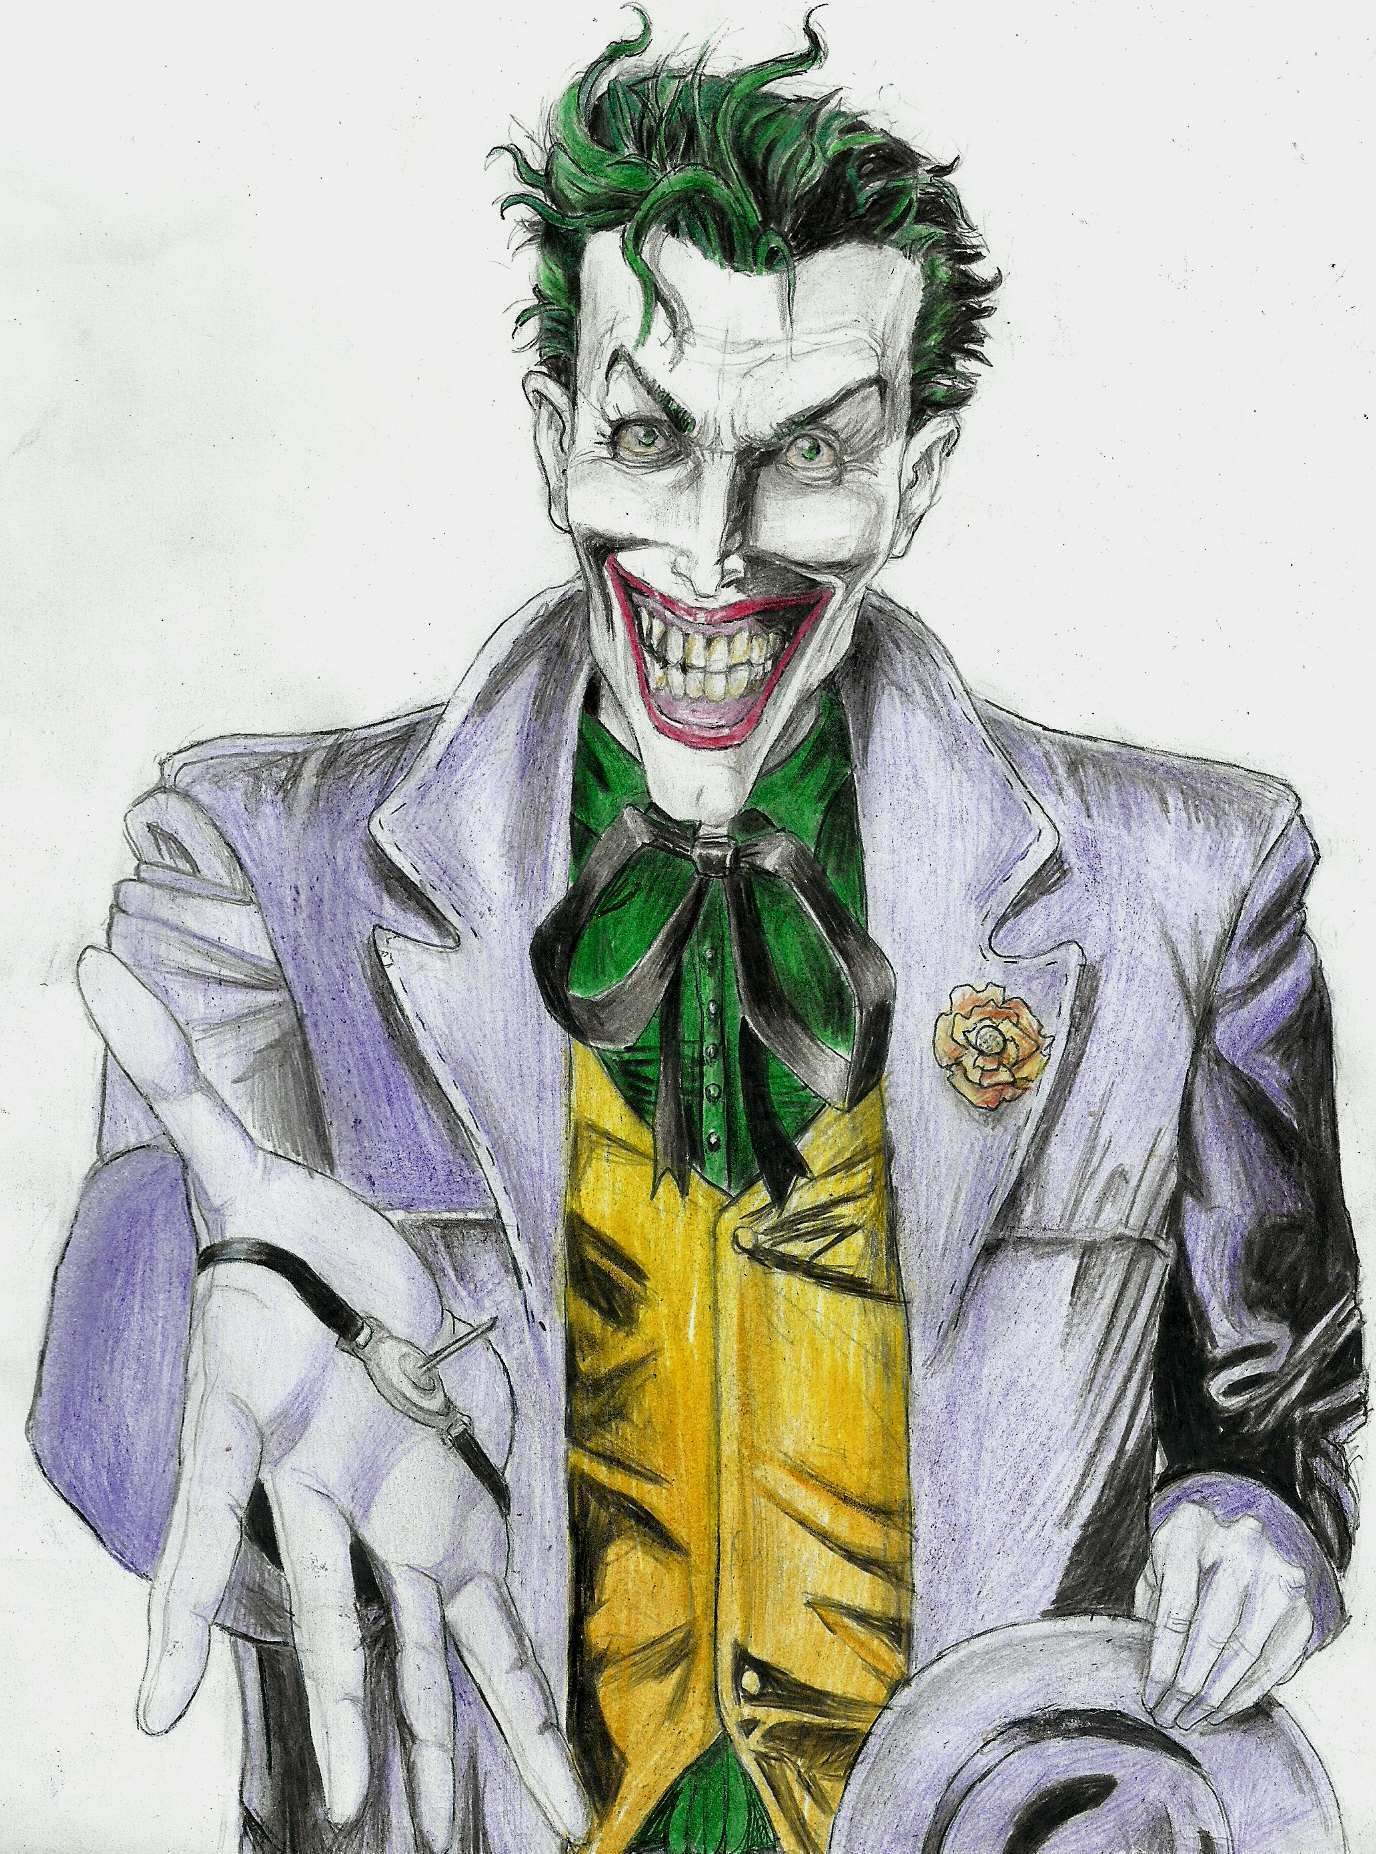 https://s-media-cache-ak0.pinimg.com/originals/ed/de/46/edde46f7169f56d9a030dcafadebe6f9.jpg Comic Joker Painting